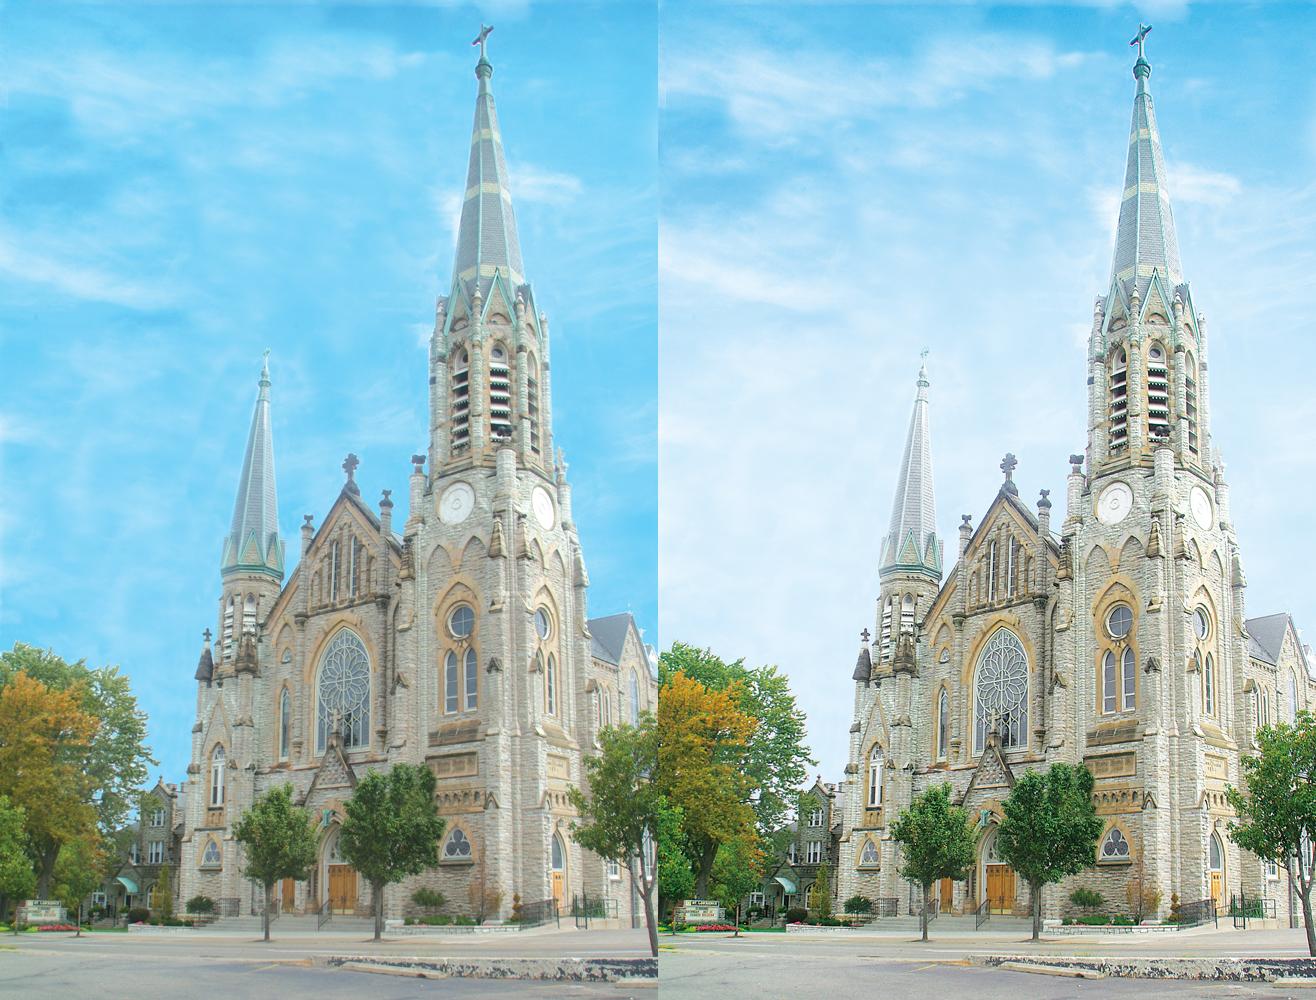 St. Lawrence Cincinnati